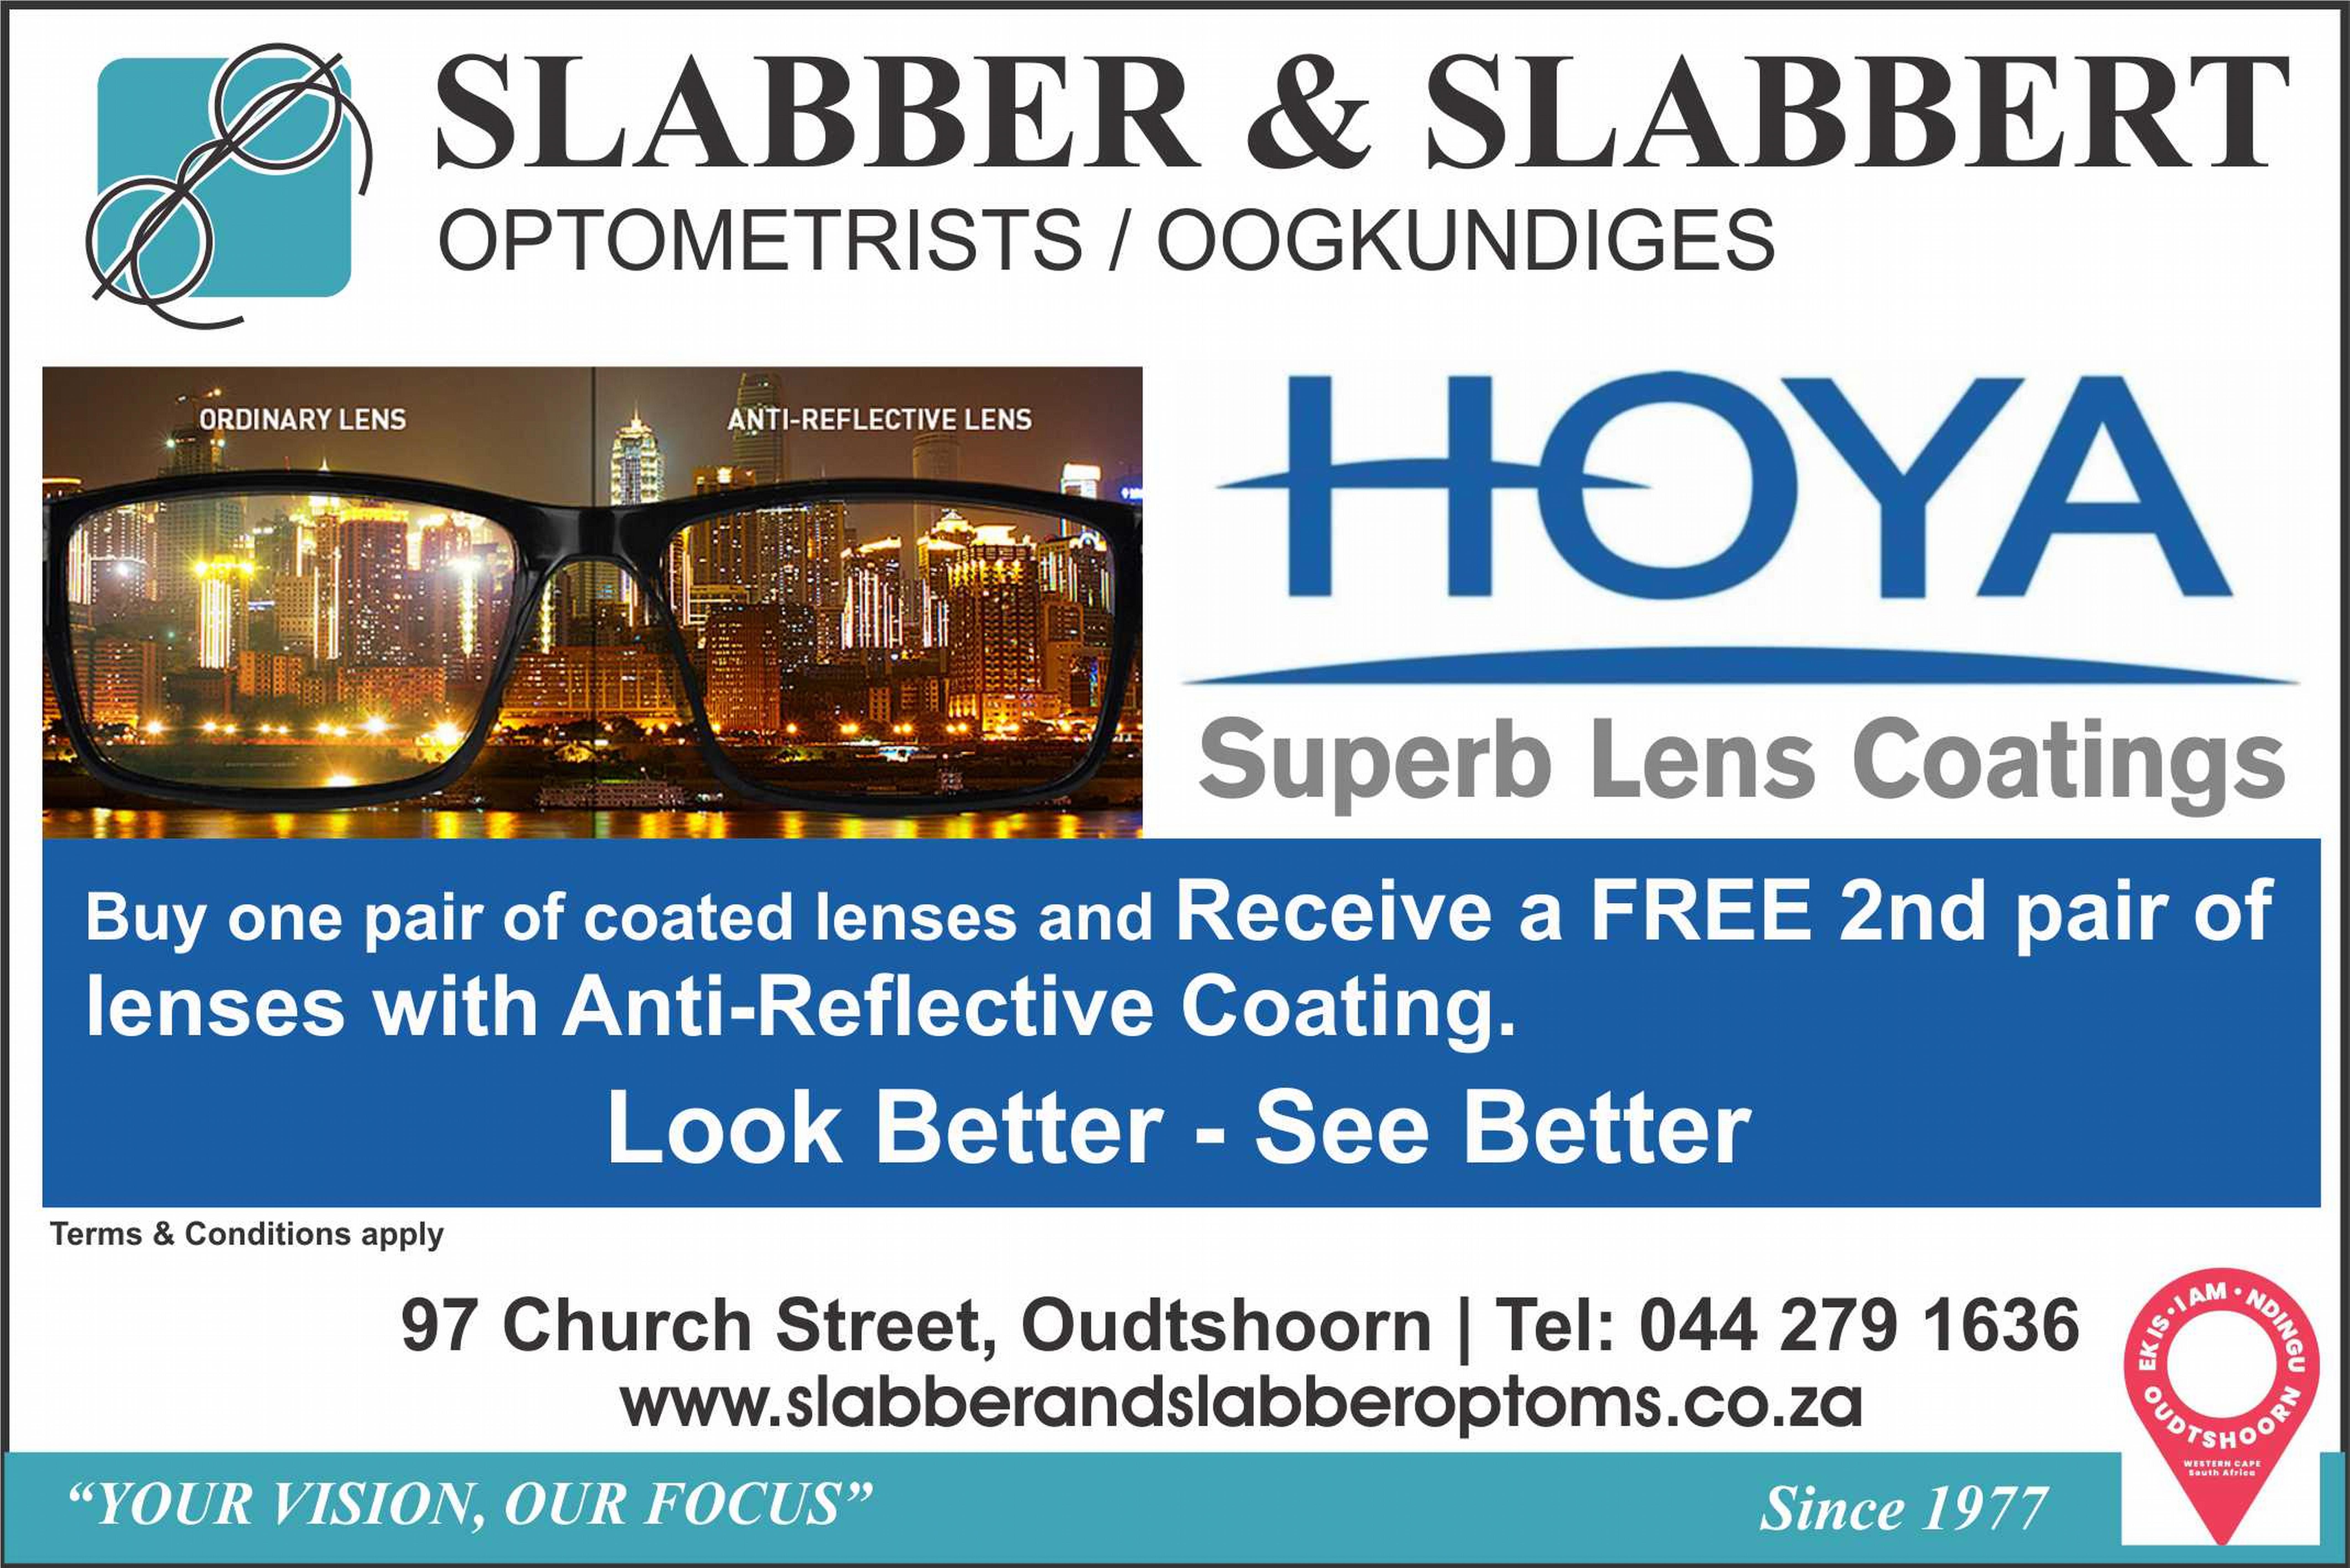 Superb Lens Coatings